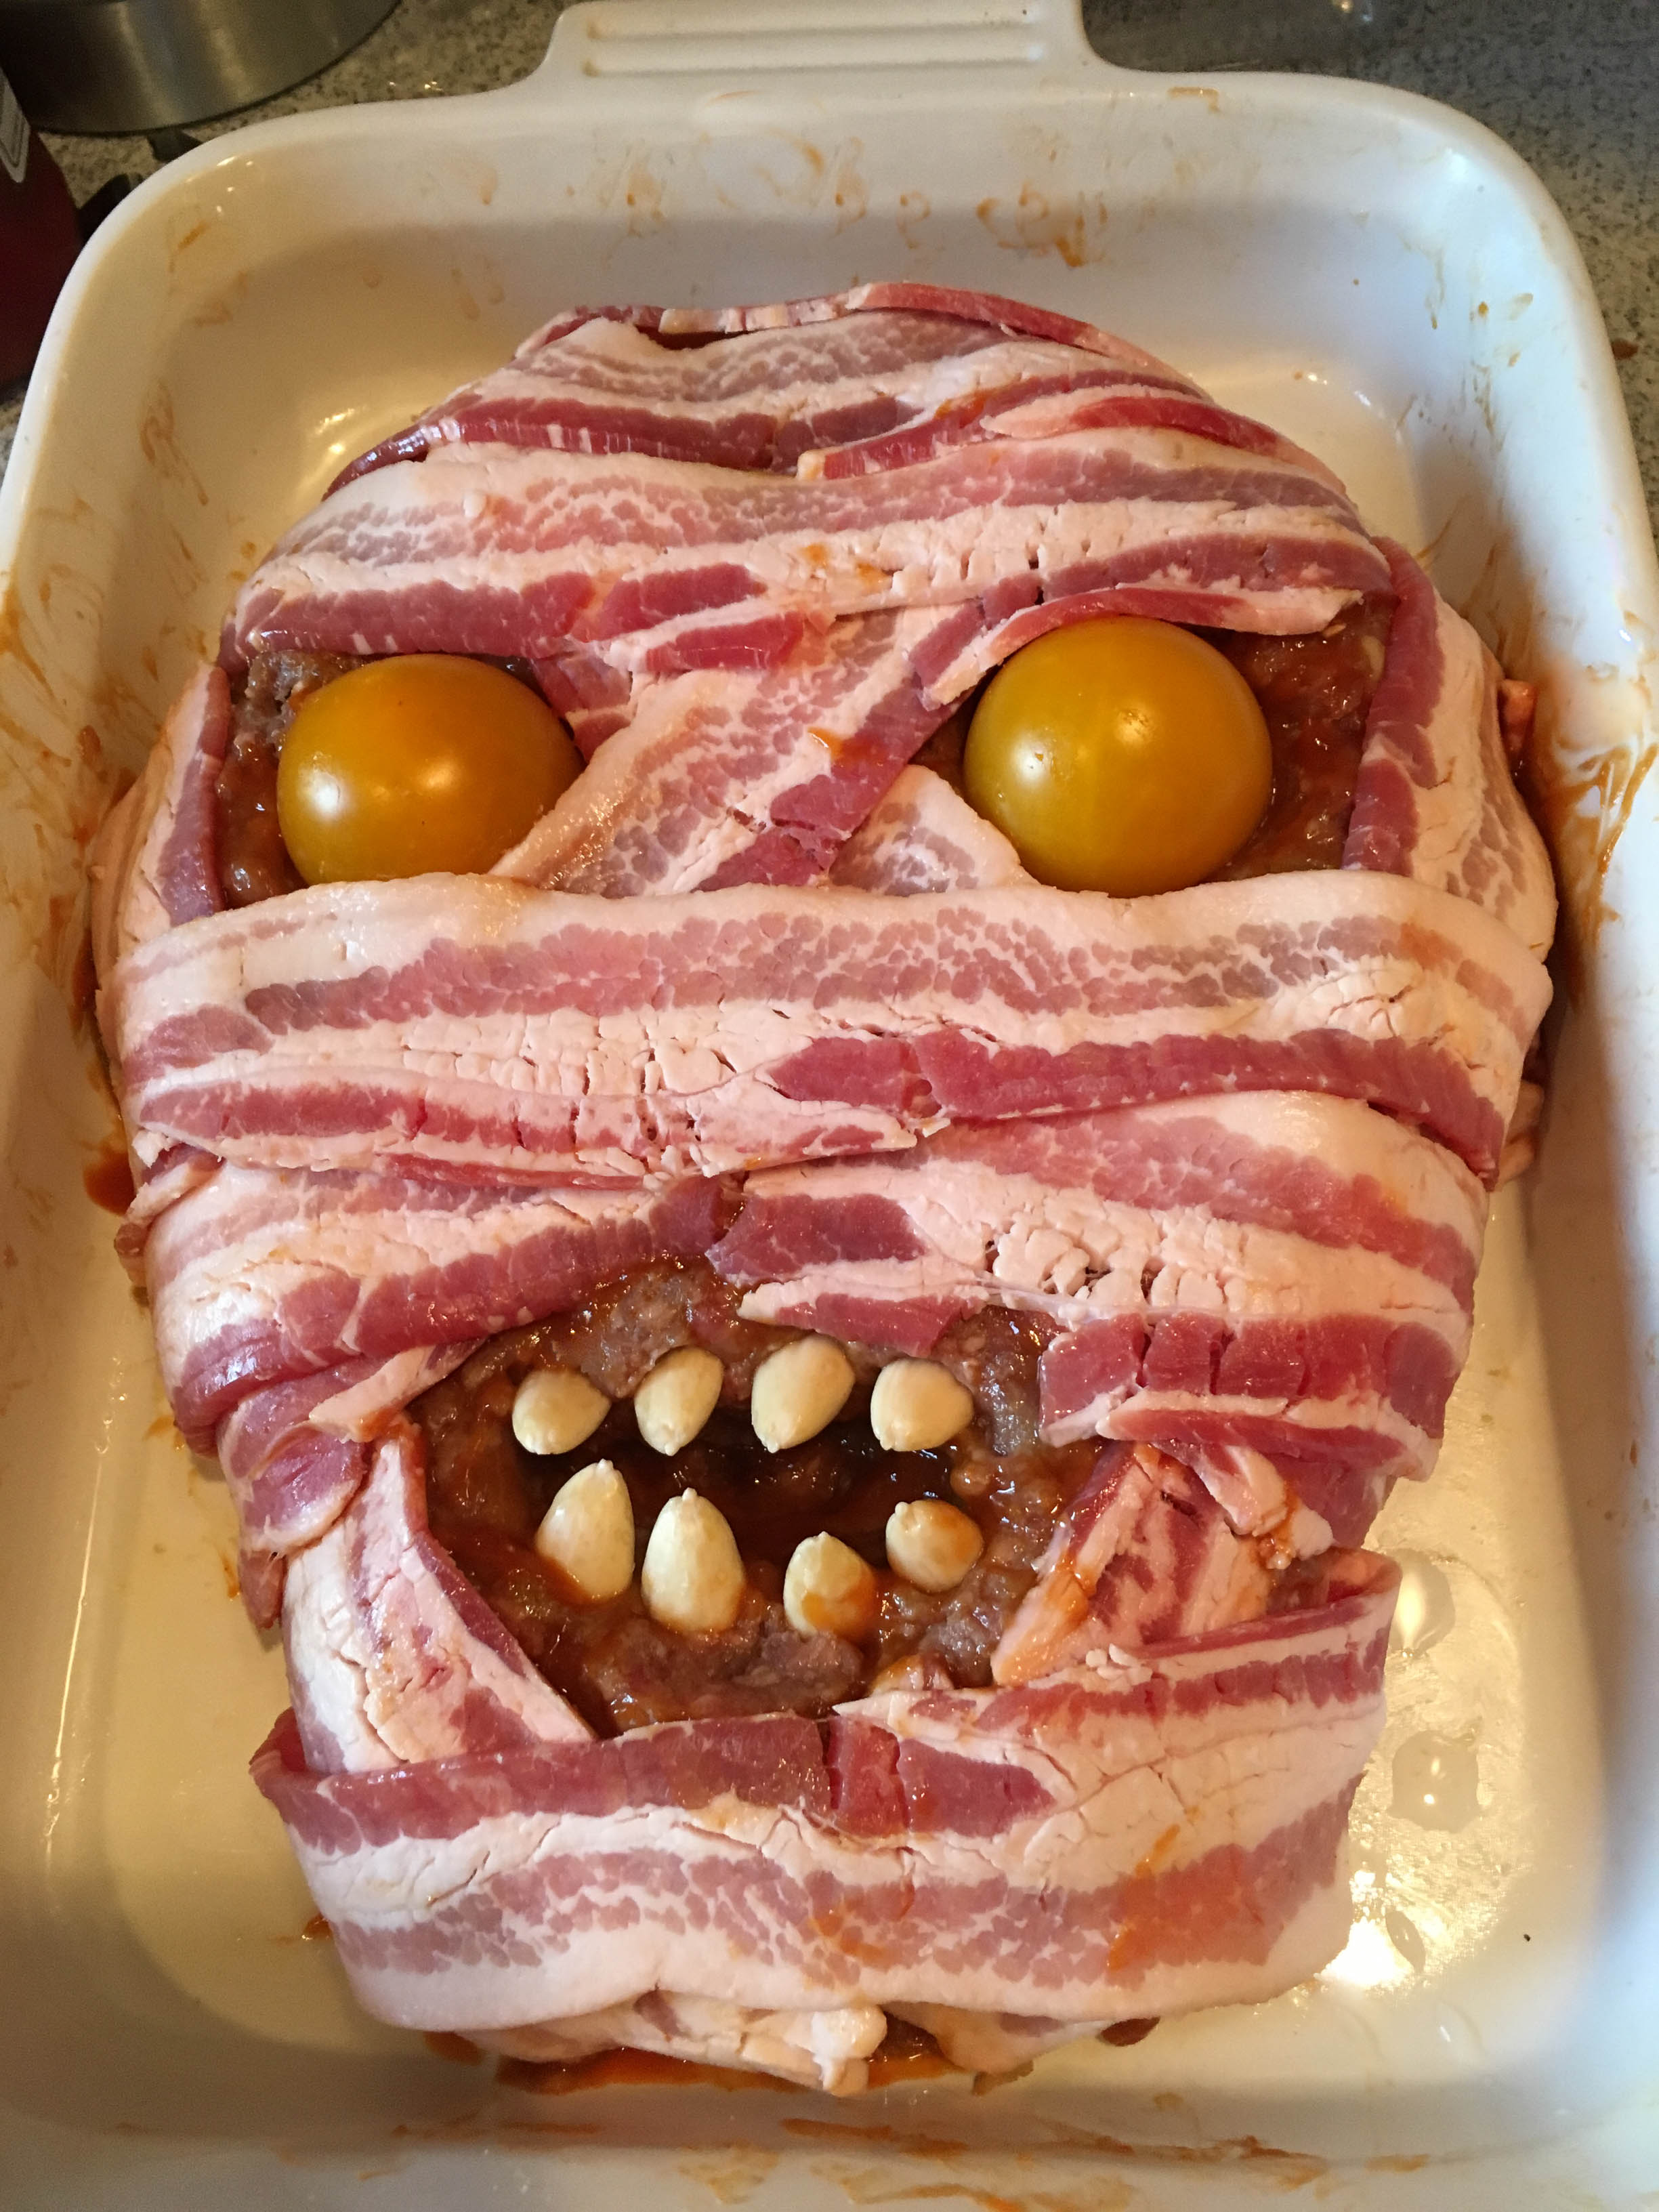 Halloween Meatloaf \u2014 Sweet \u2022 Sour \u2022 Savory